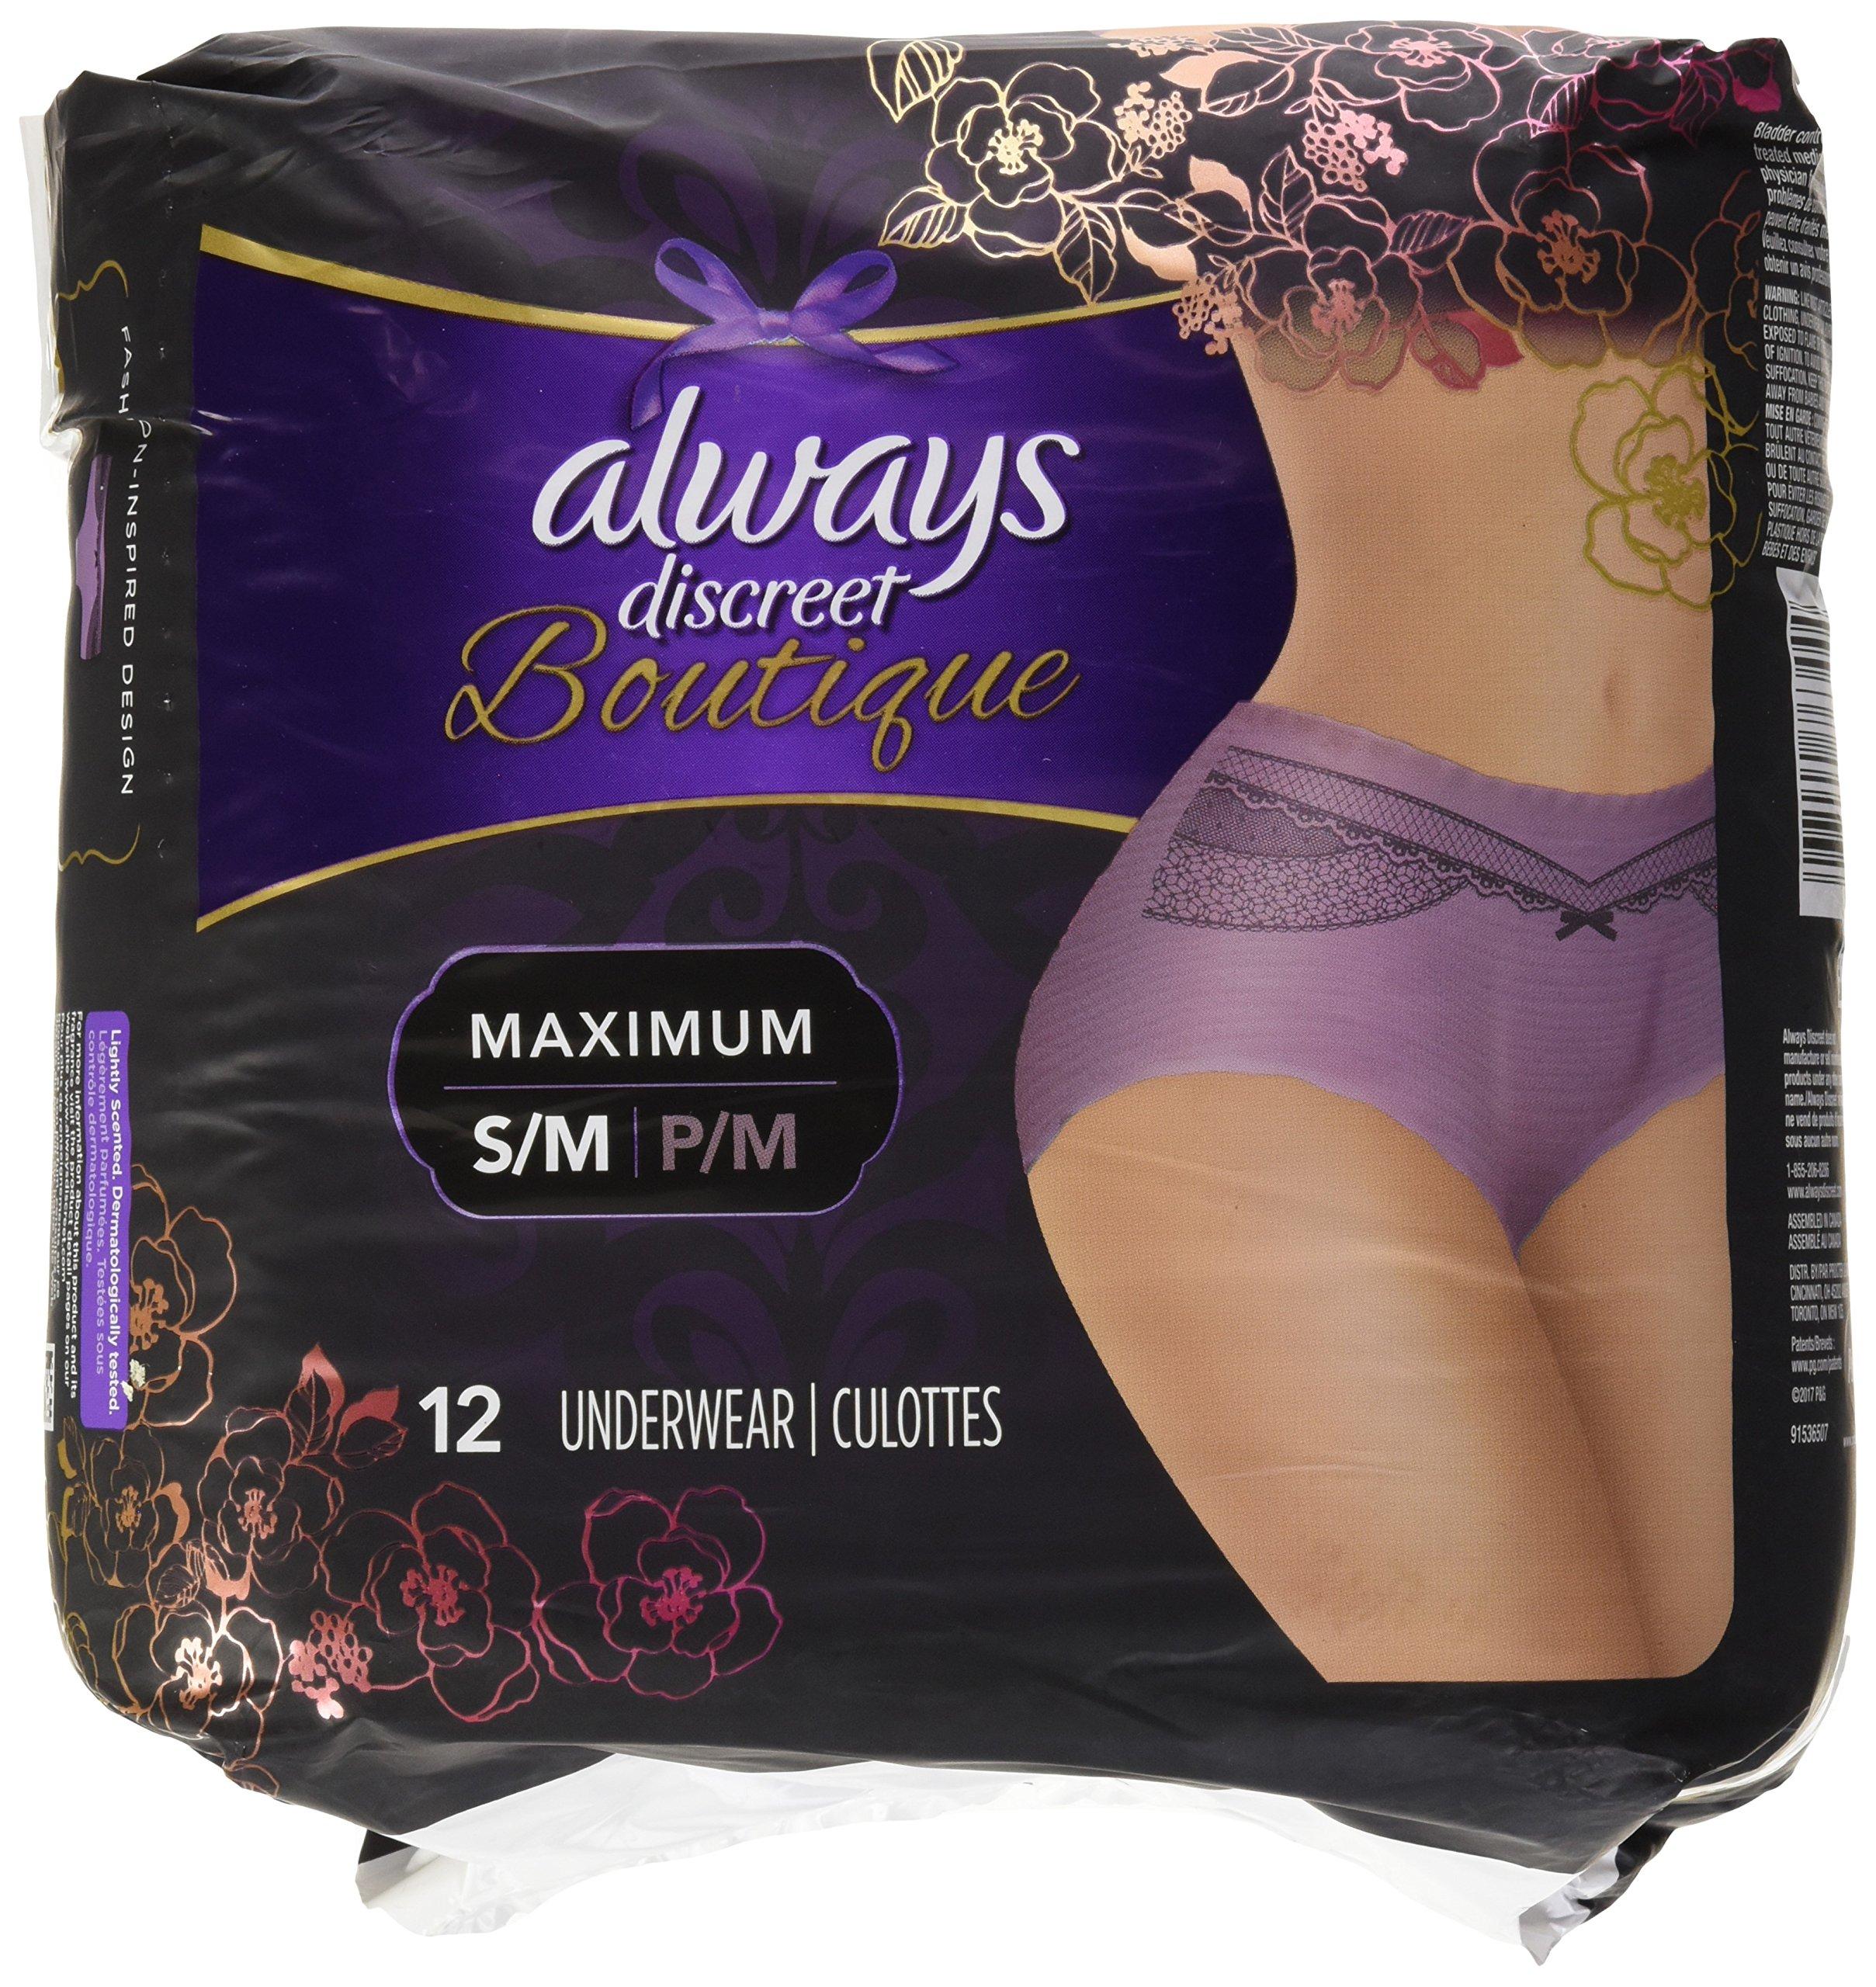 12 Count (1 Package), Small/Medium - Always Discreet Boutique Incontinence Underwear Maximum, Mauve